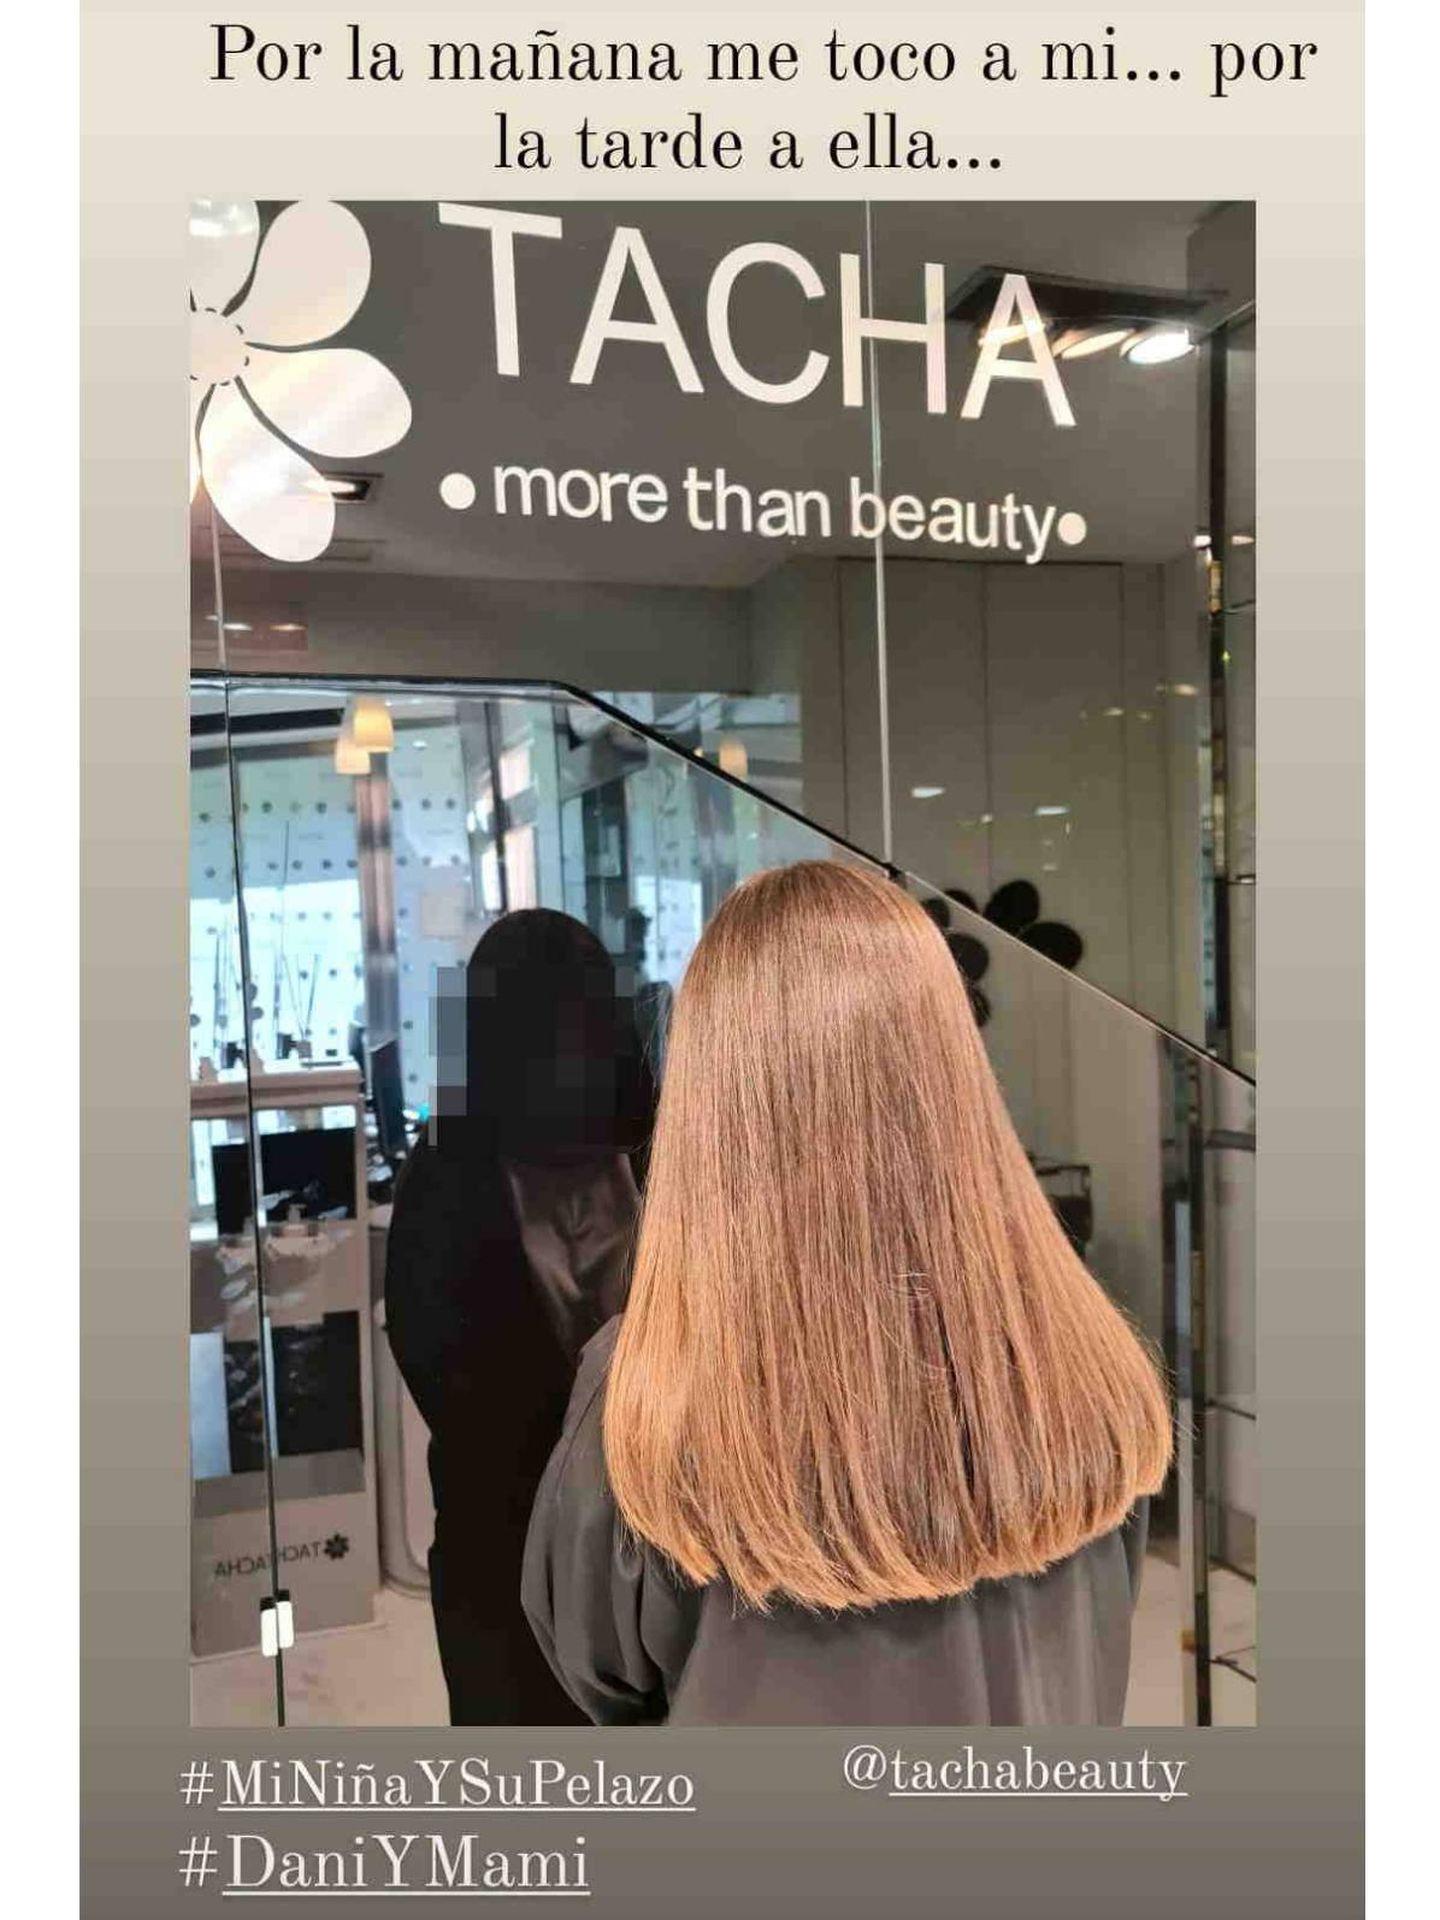 Daniella Bustamante, a la salida de Tacha Beauty. (Instagram @pau_eche)